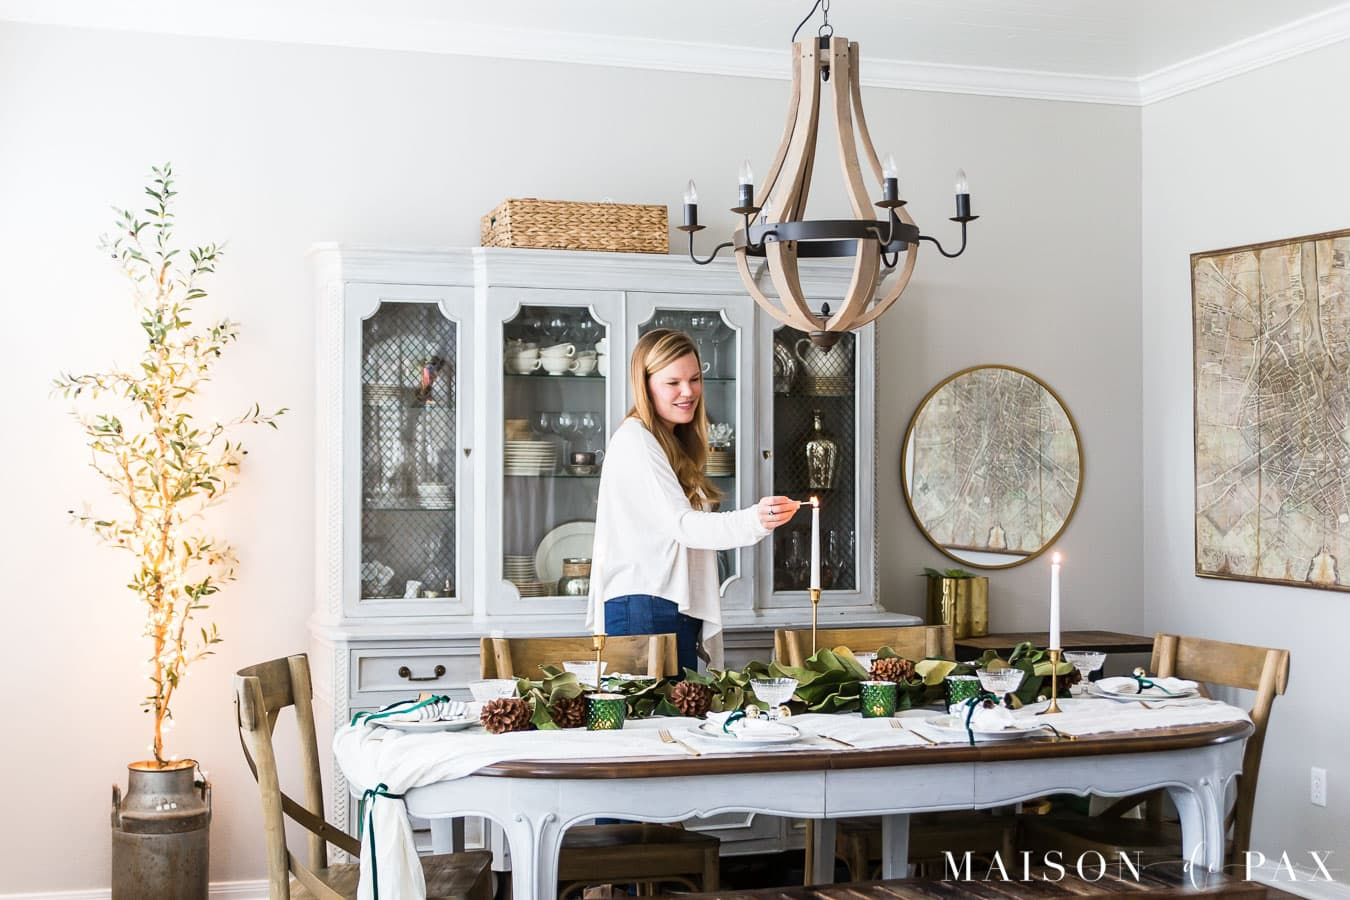 lighting candlestick on christmas table centerpiece | Maison de Pax